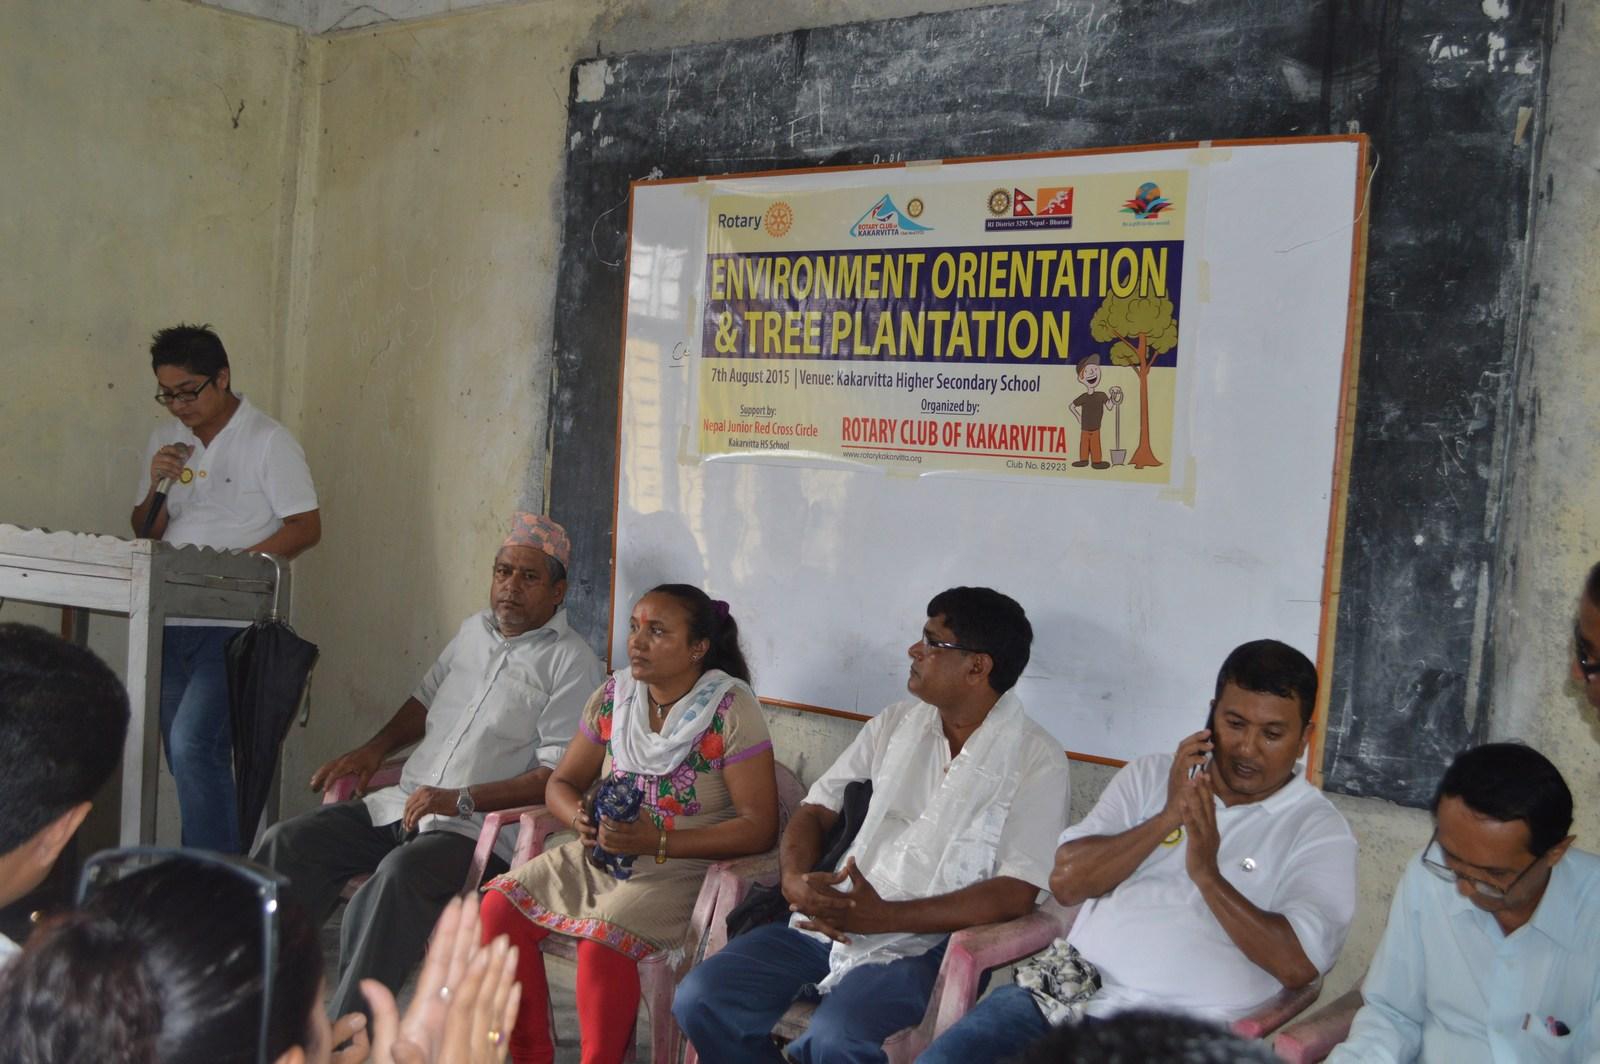 Enviroment Orientation Tree Plantation Rotary Club Of Kakarvitta 2